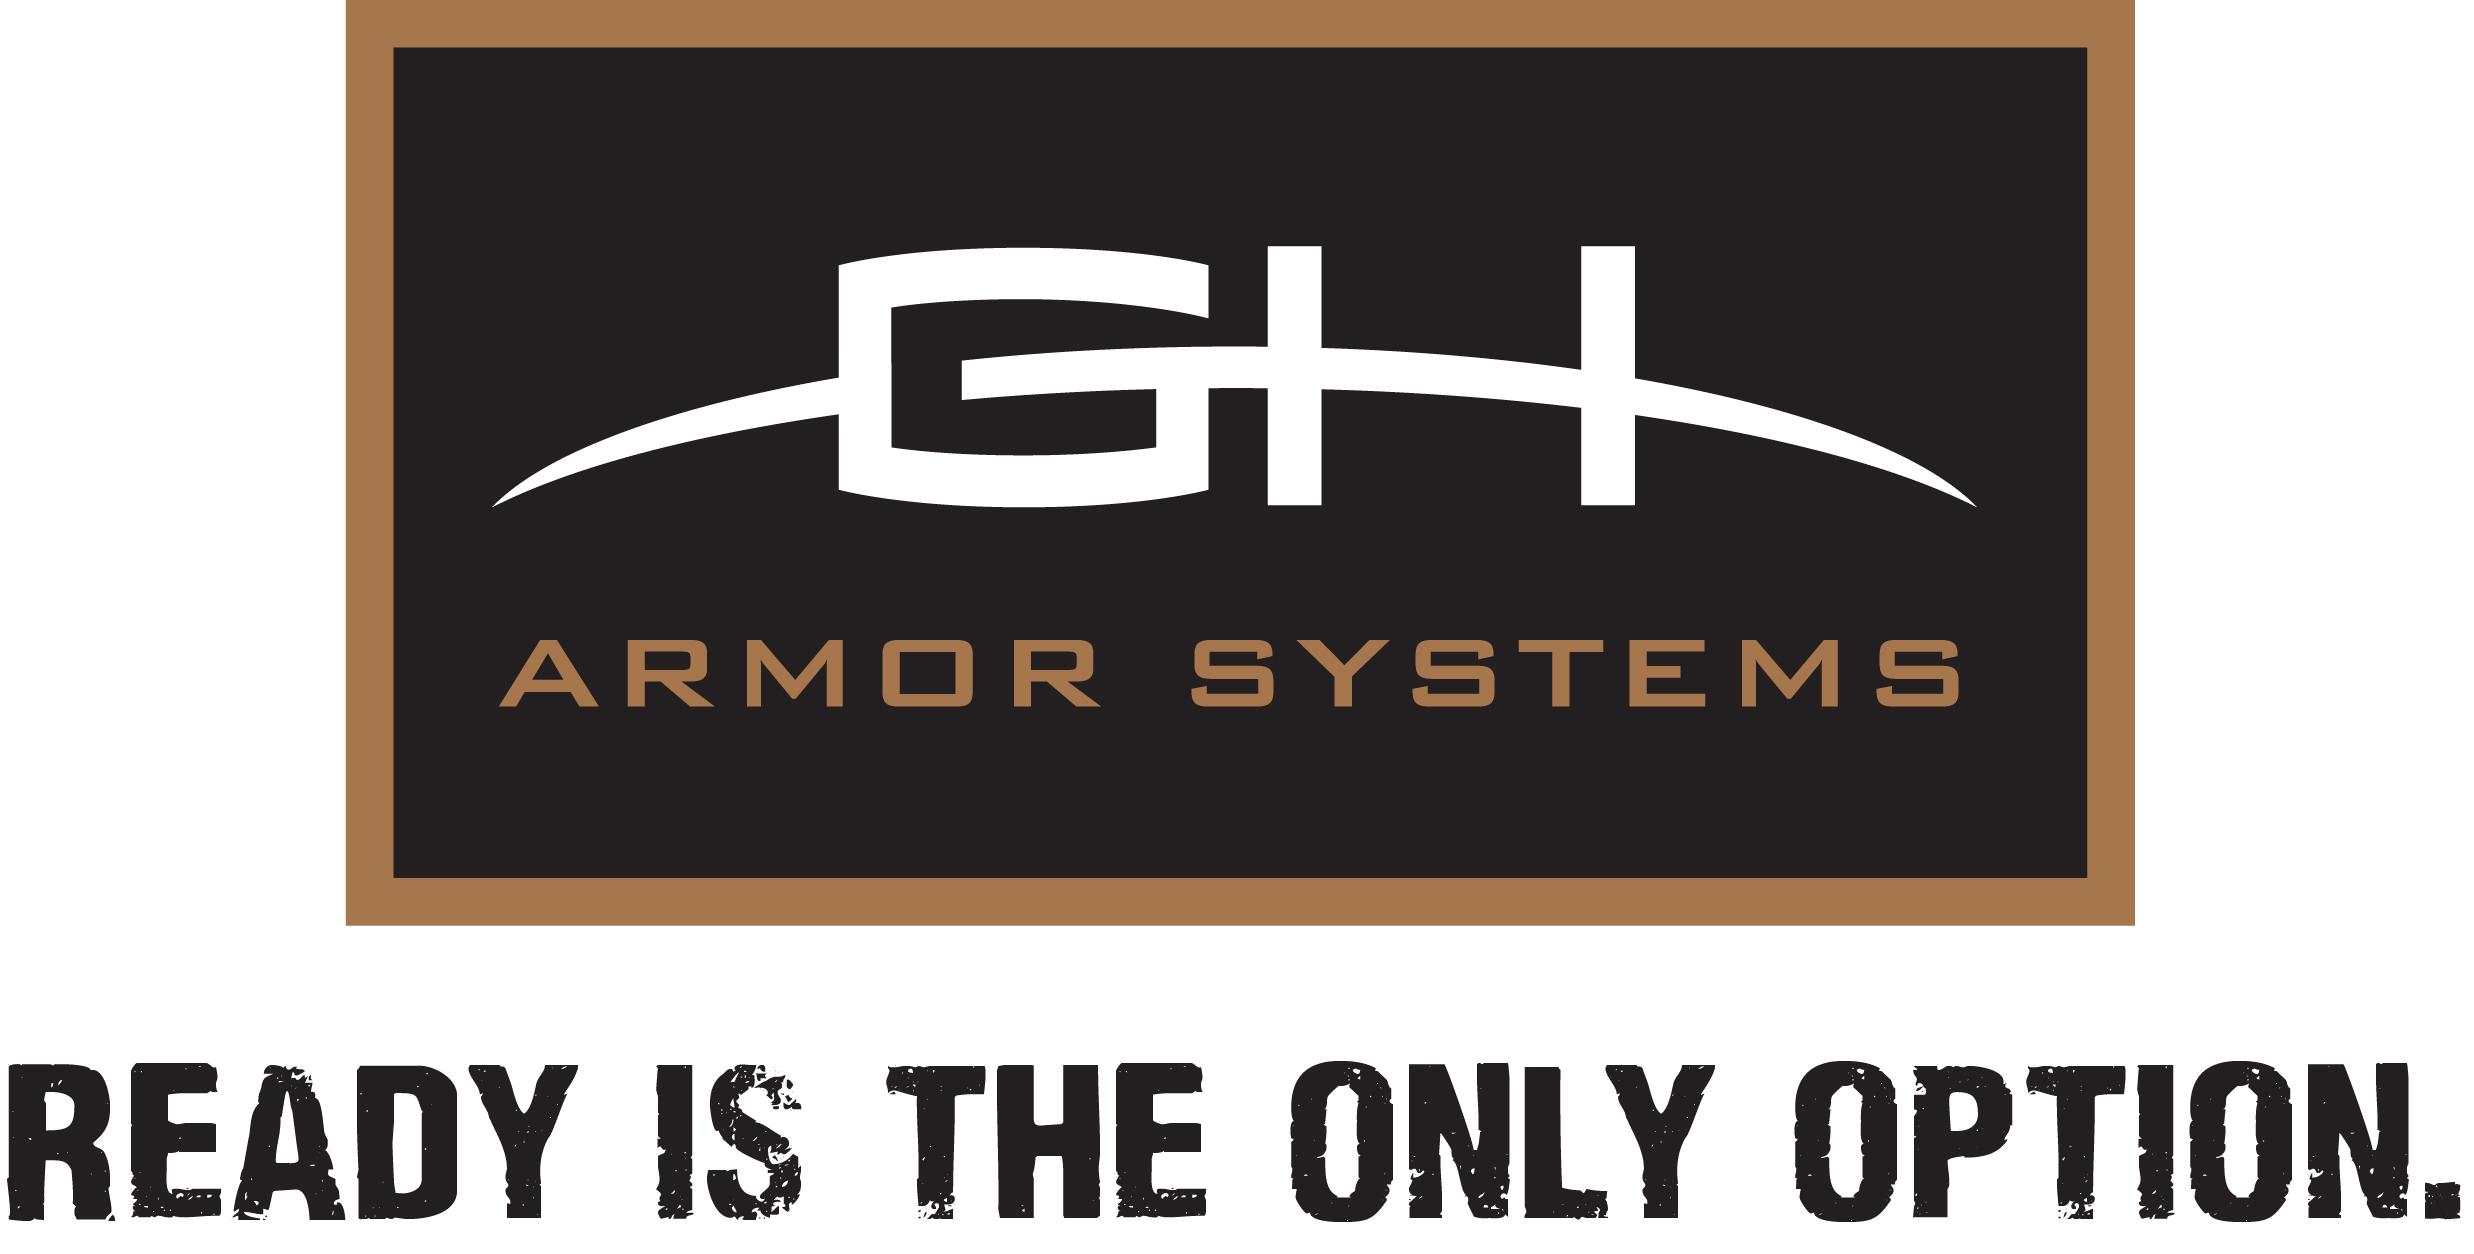 GHArmorSystemsLogo_print.jpg